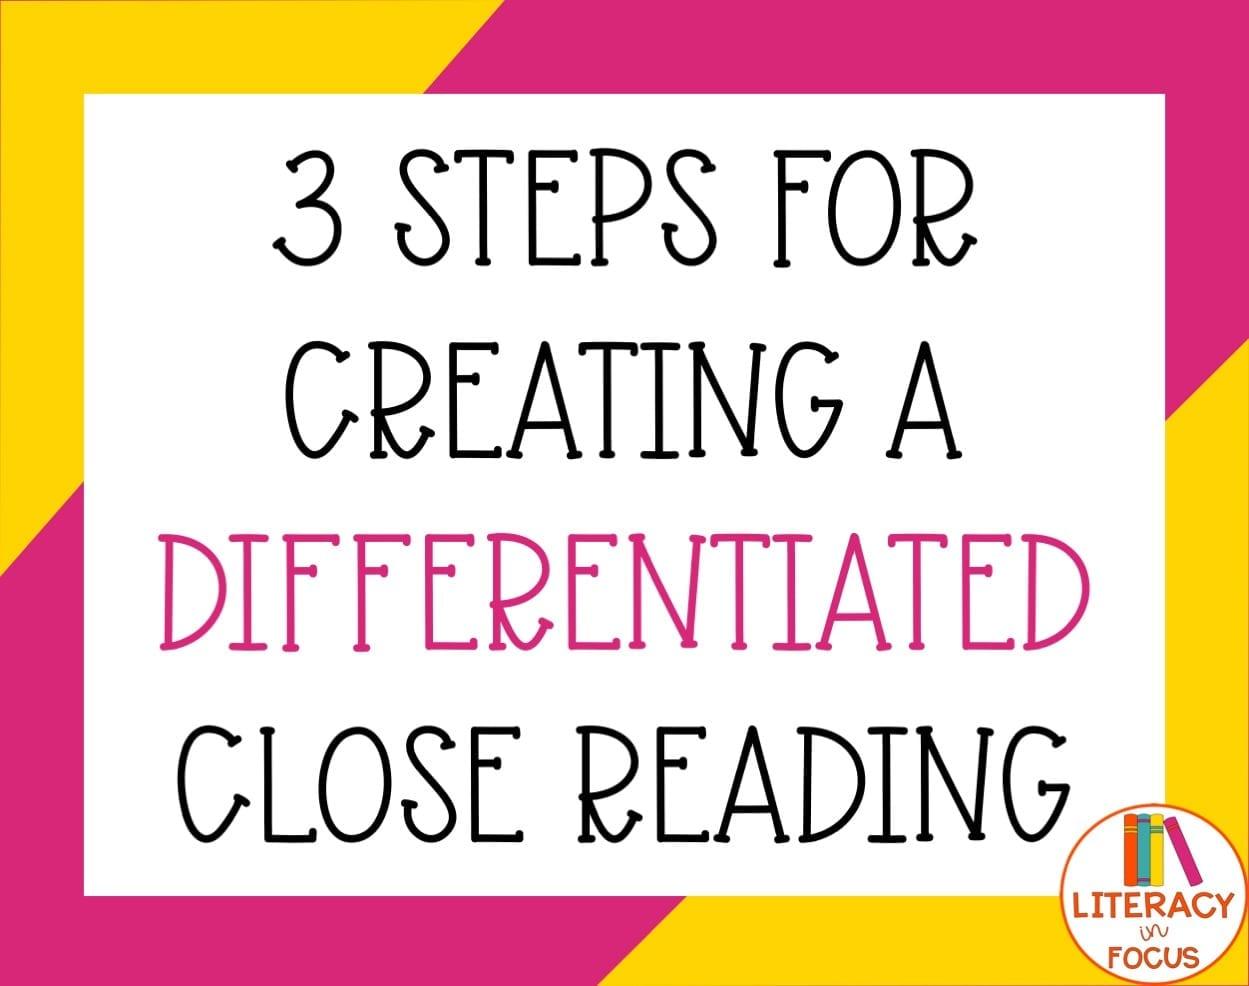 Close Reading DIY